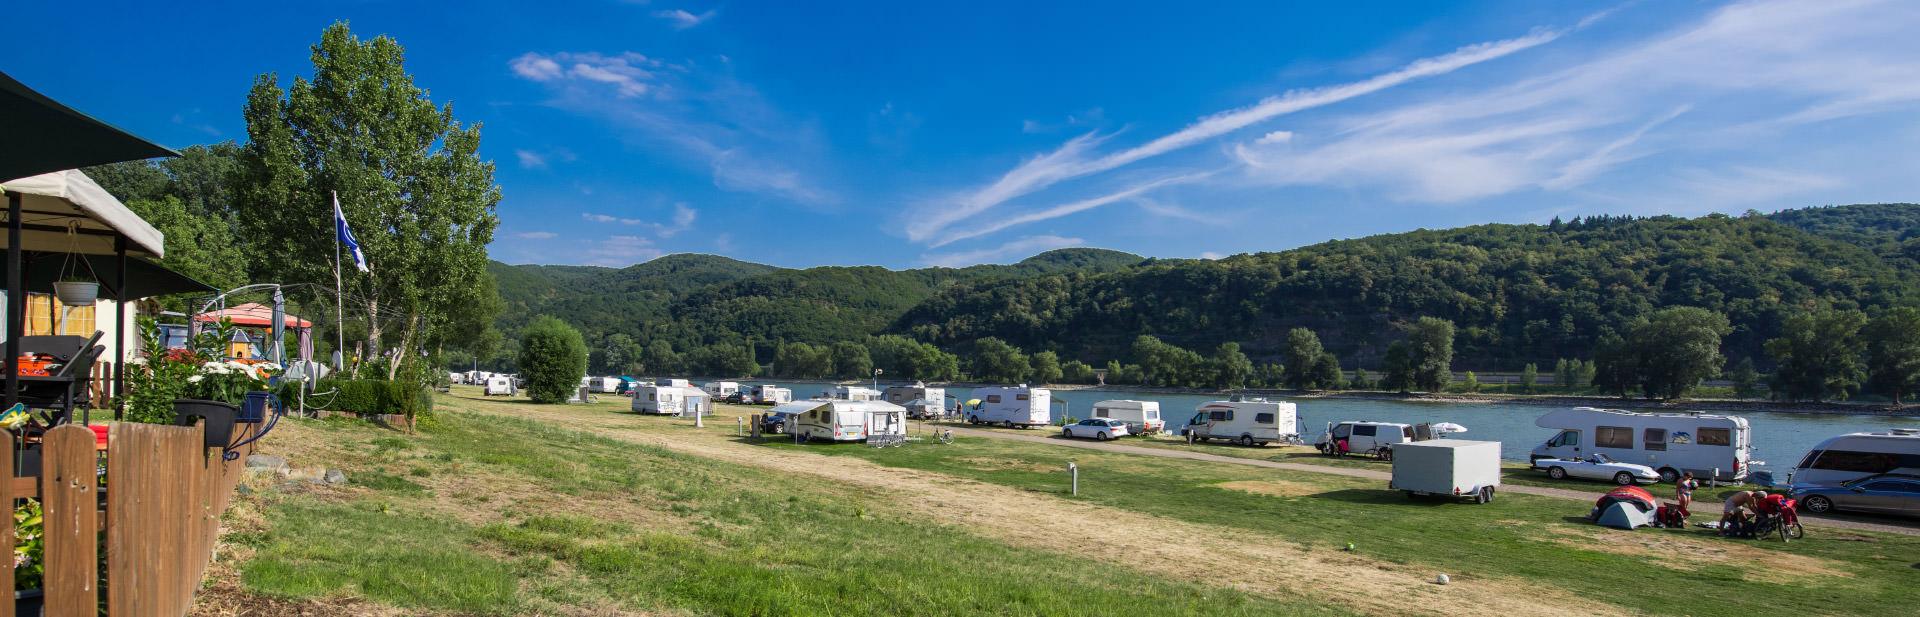 sonneneck-campingplatz-bopperd-home1